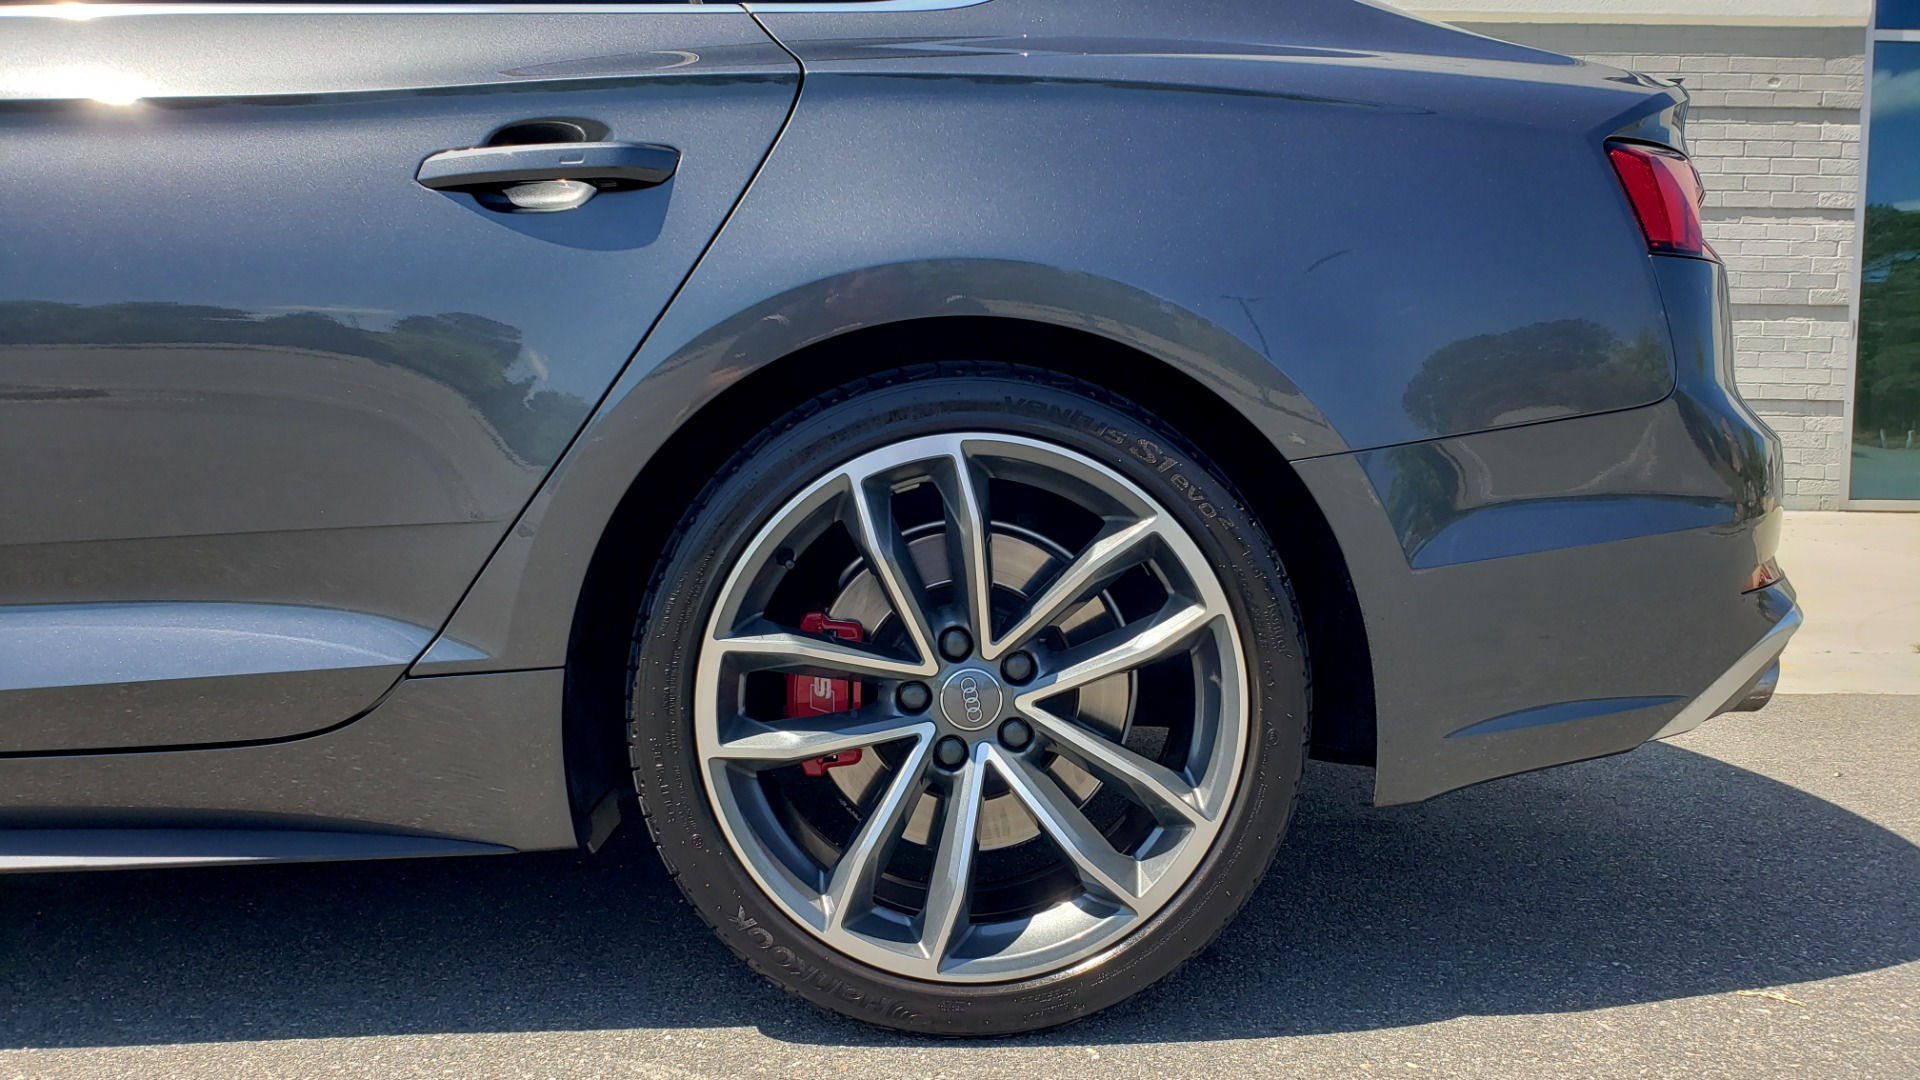 Used 2018 Audi S5 SPORTBACK PRESTIGE S-SPORT / NAV / SUNROOF / HUD / B&O SND / REARVIEW for sale $48,995 at Formula Imports in Charlotte NC 28227 73